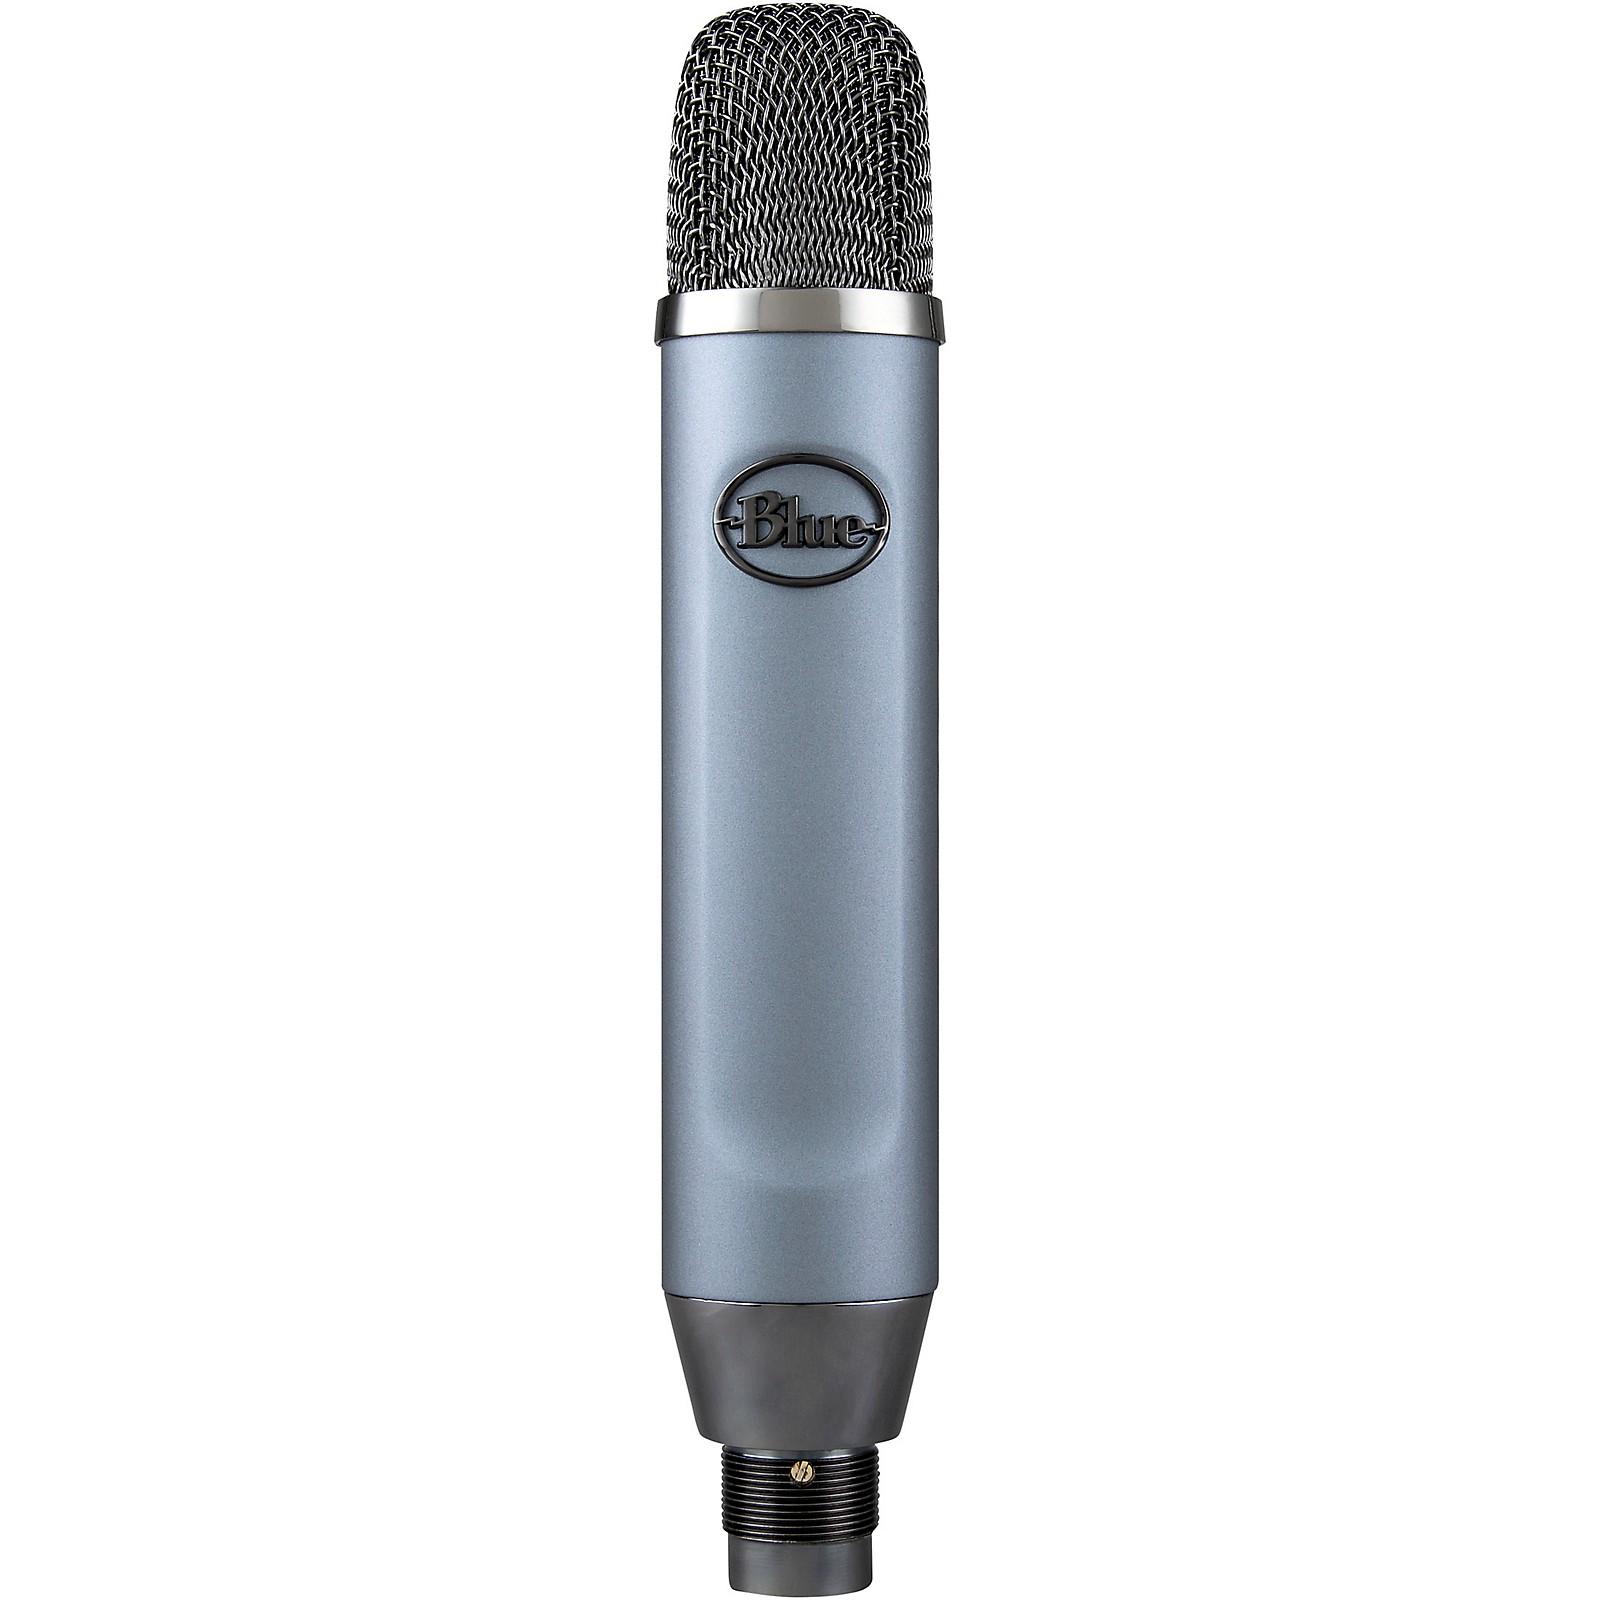 BLUE Ember Small Diaphragm Studio Condenser Microphone